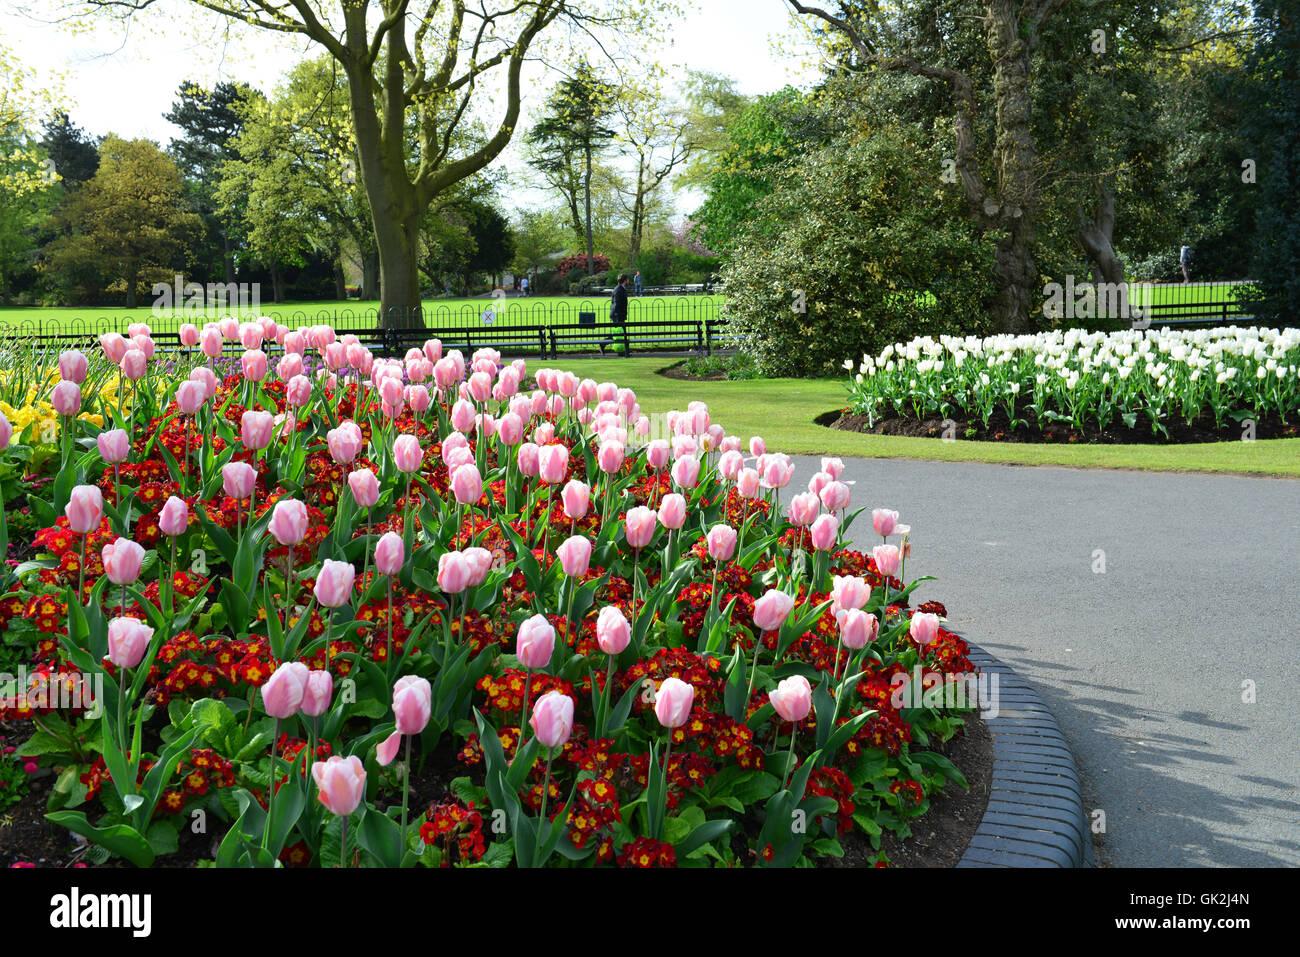 Flowers in Belfast - Stock Image